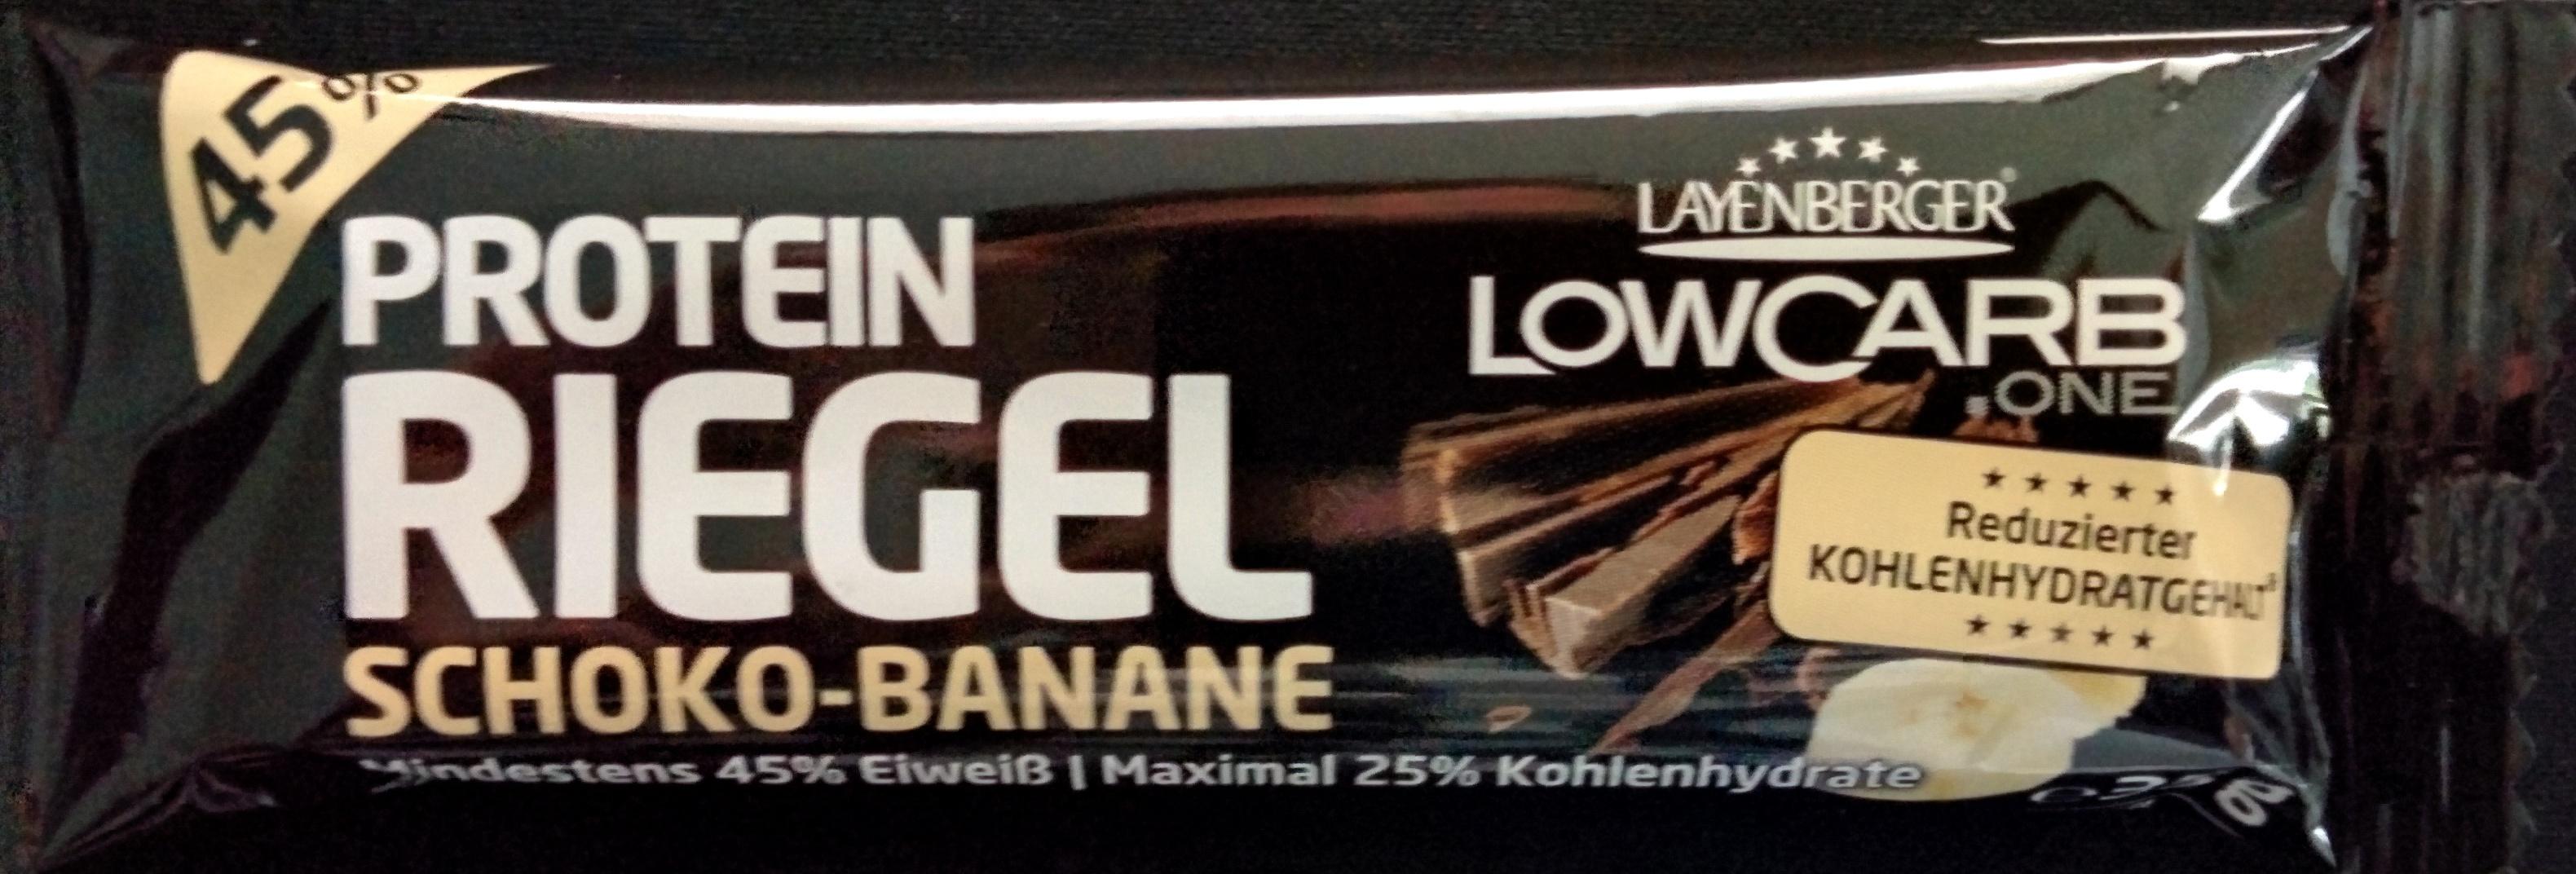 Protein Riegel Schoko-Banane - Produit